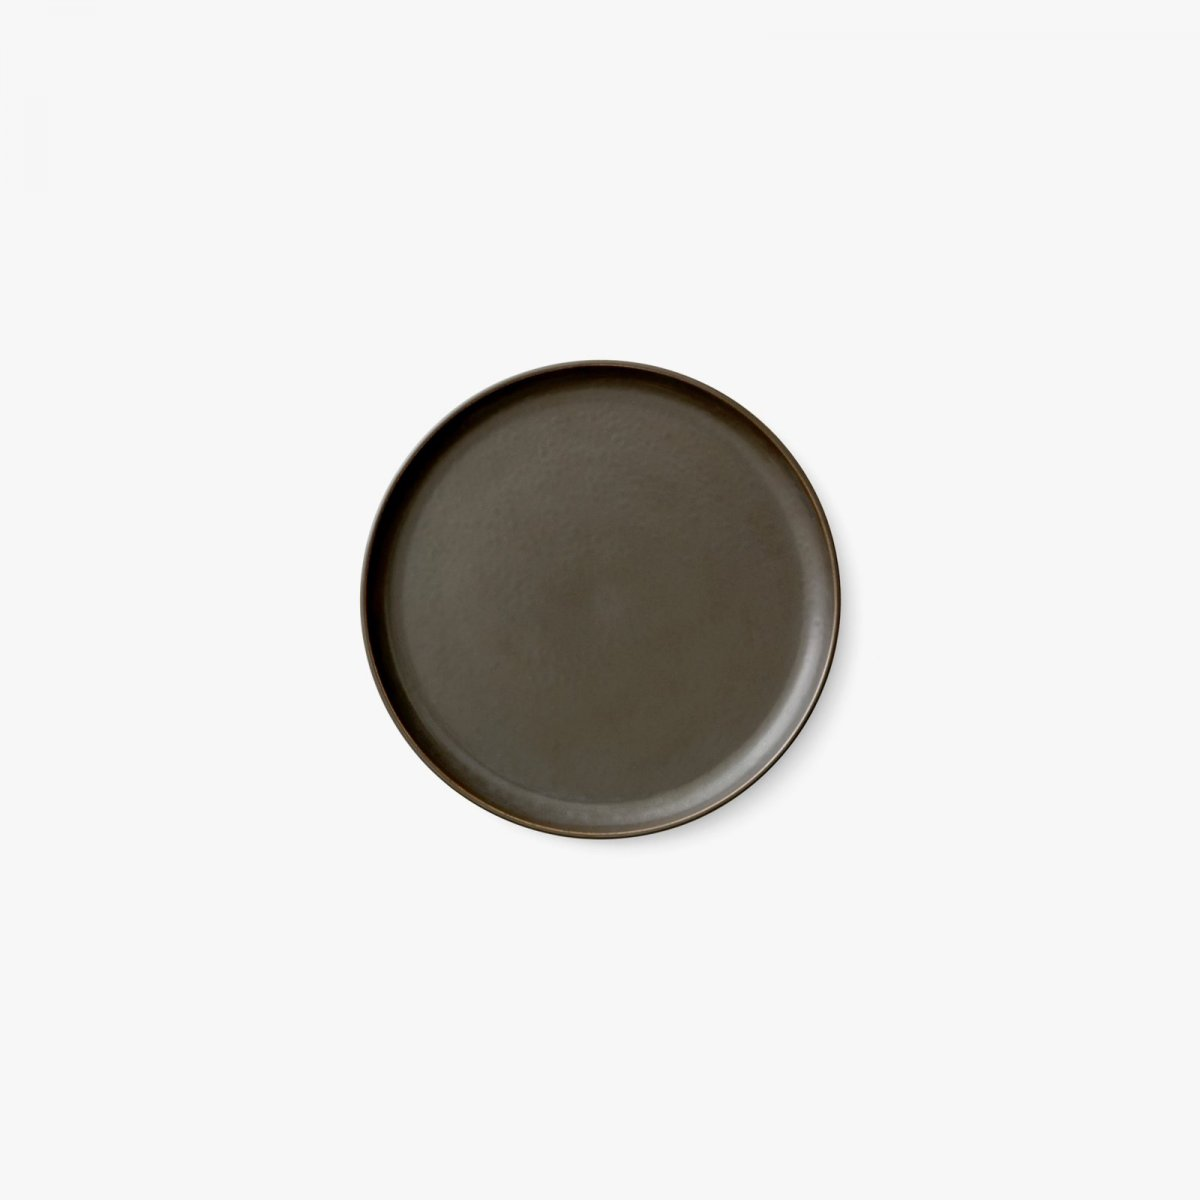 New Norm Lunch Plate, Ø 23 cm, dark glazed.